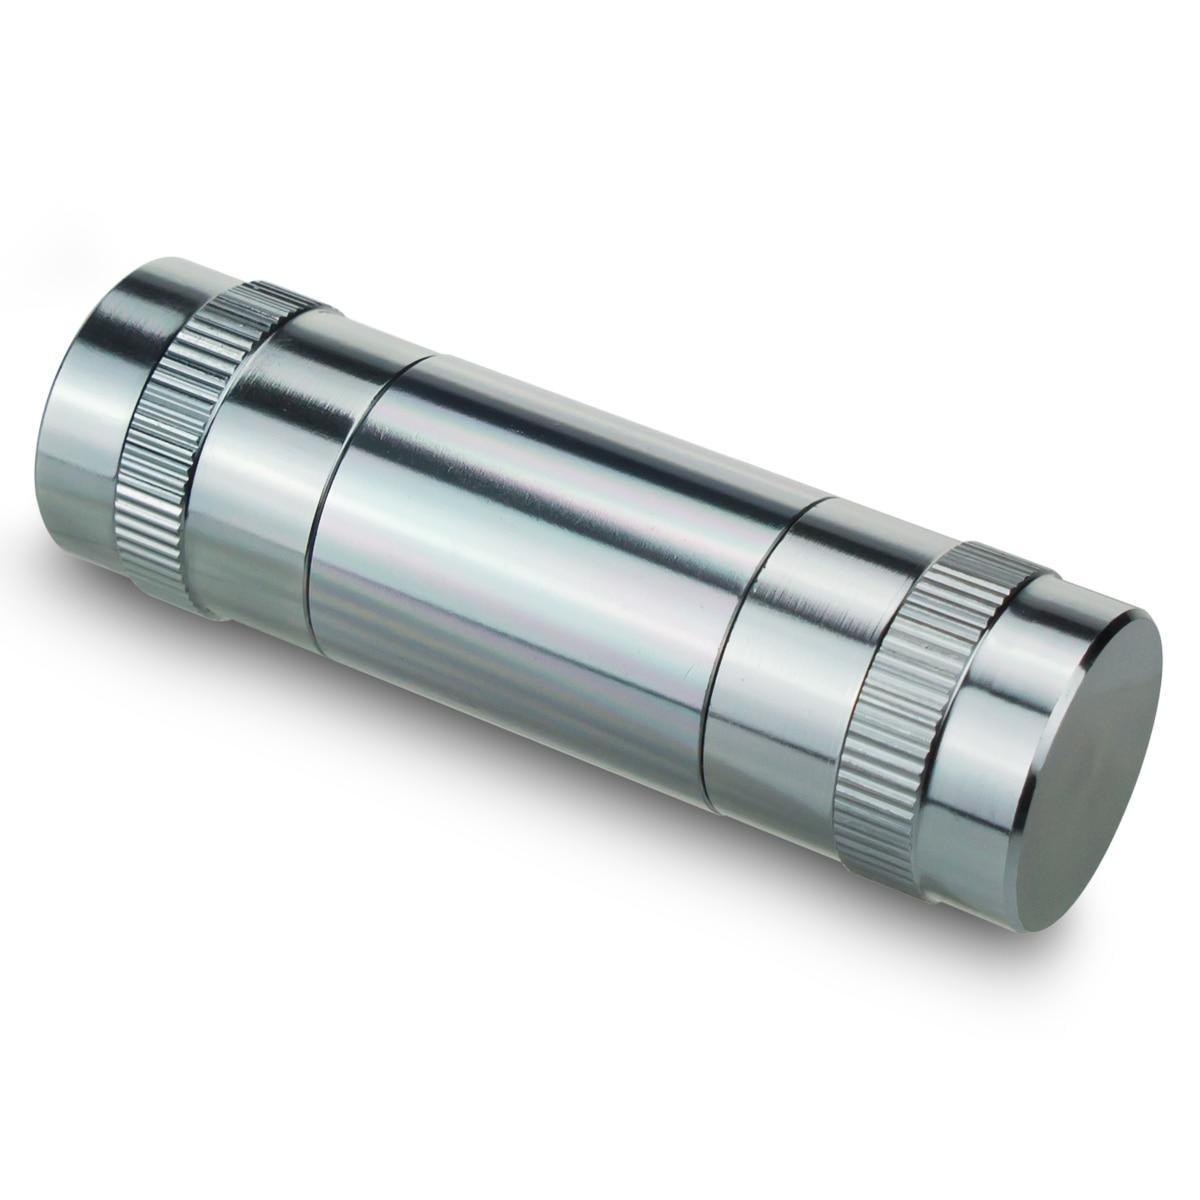 Formax420  20mm X 68mm 5 Parts Metal Stainless Steel Pollen Presser Mini Hand Pocket Tobacco Crusher Compressor enlarge